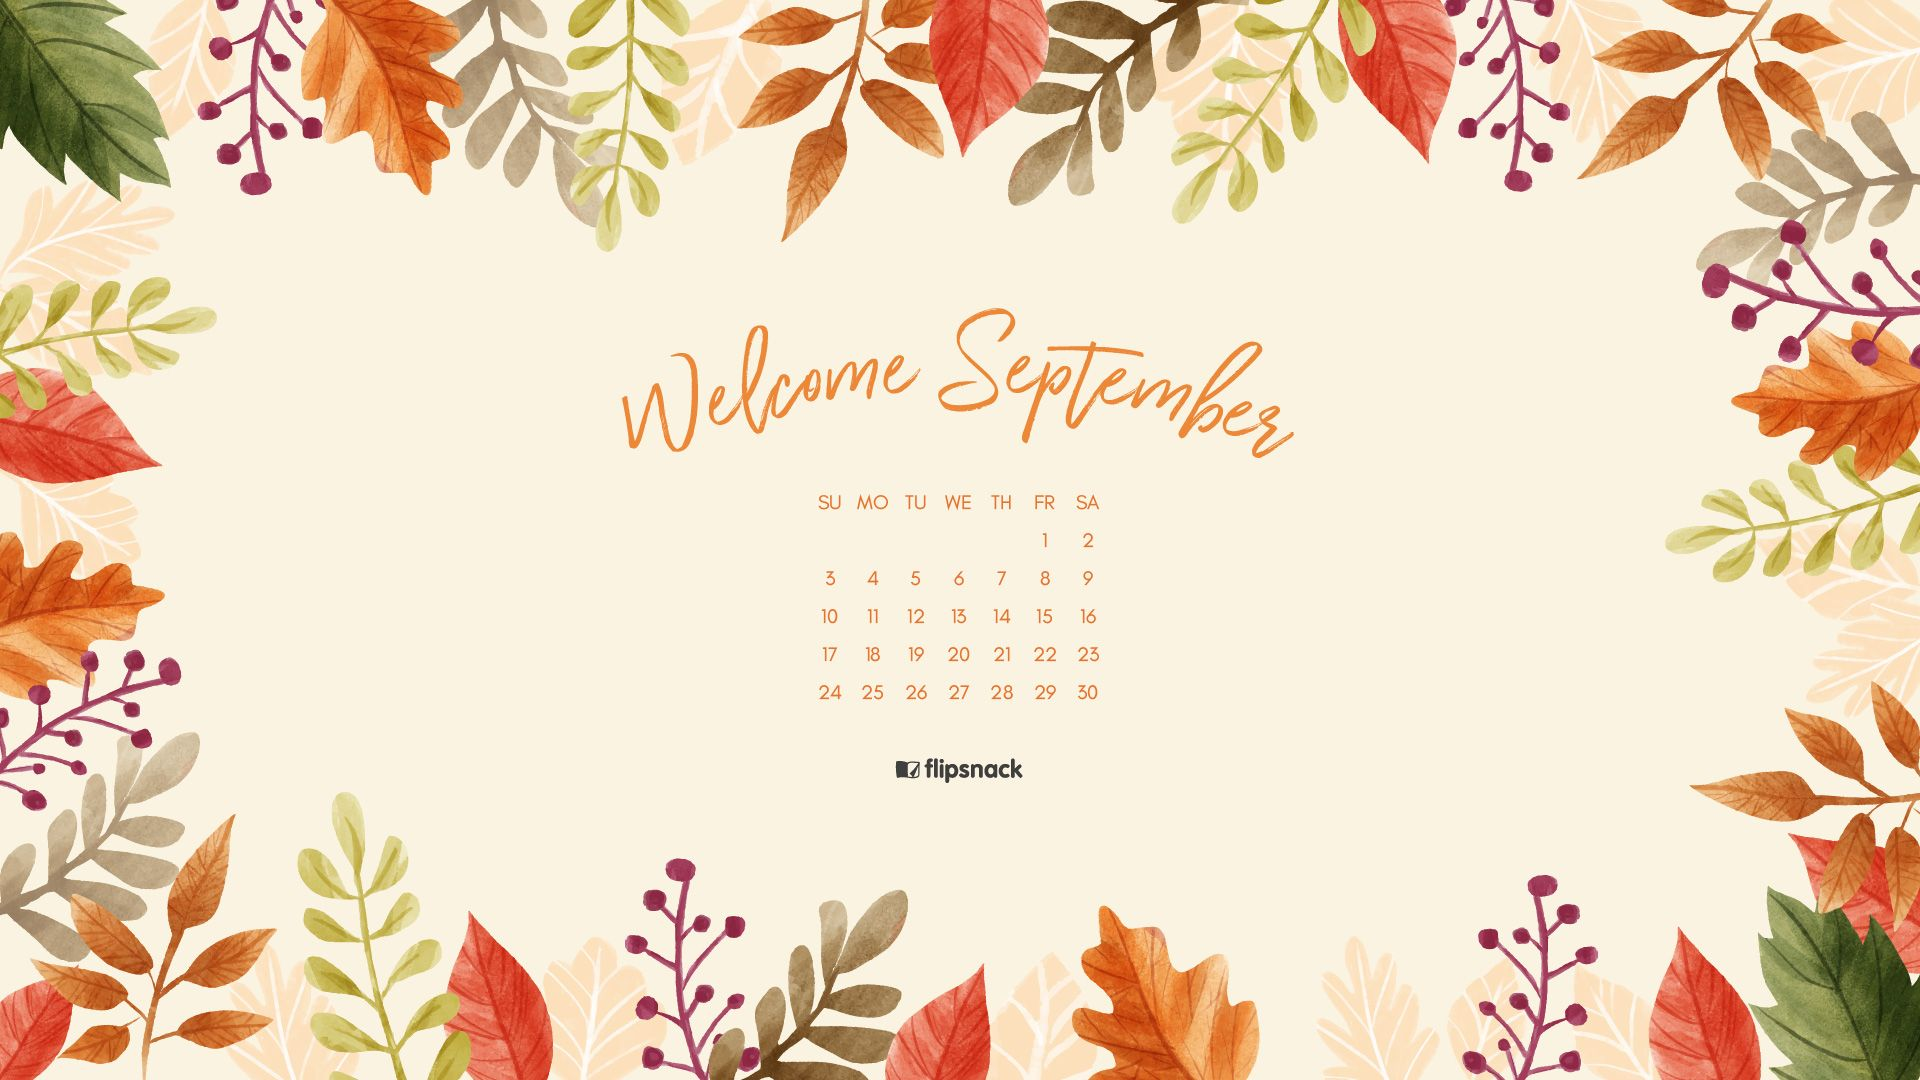 Your September 2017 Calendar Wallpaper Is Here Get It Calendar Wallpaper Desktop Wallpaper Calendar Spring Desktop Wallpaper